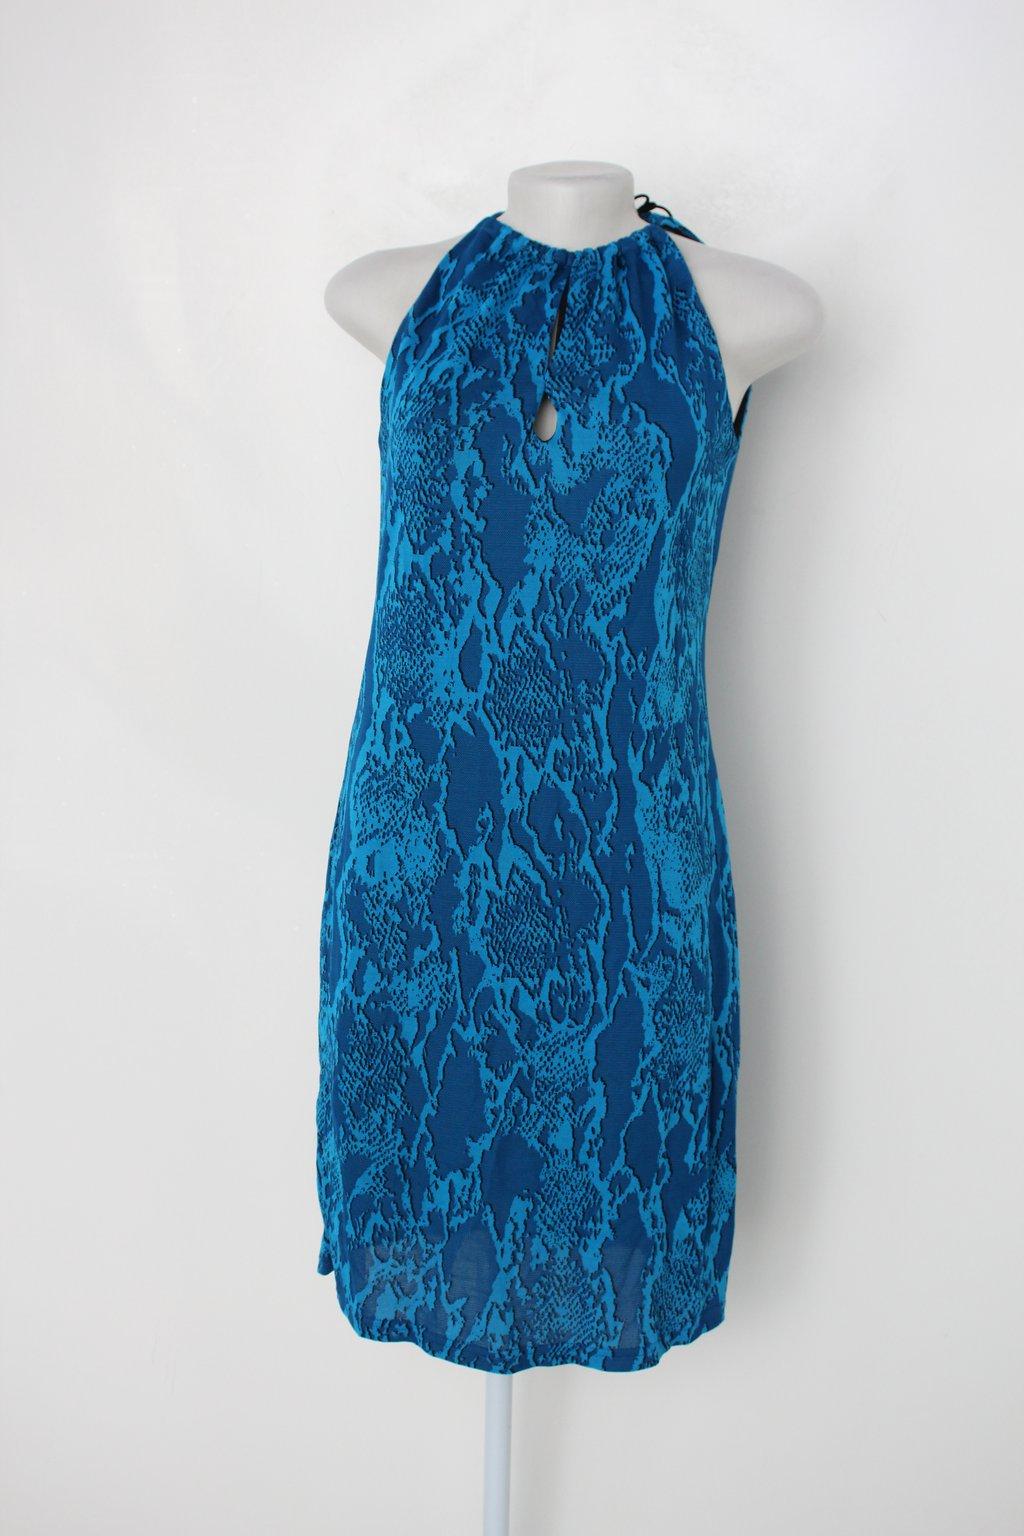 Vestido Union Brazil Feminino Azul Estampado Com Forro